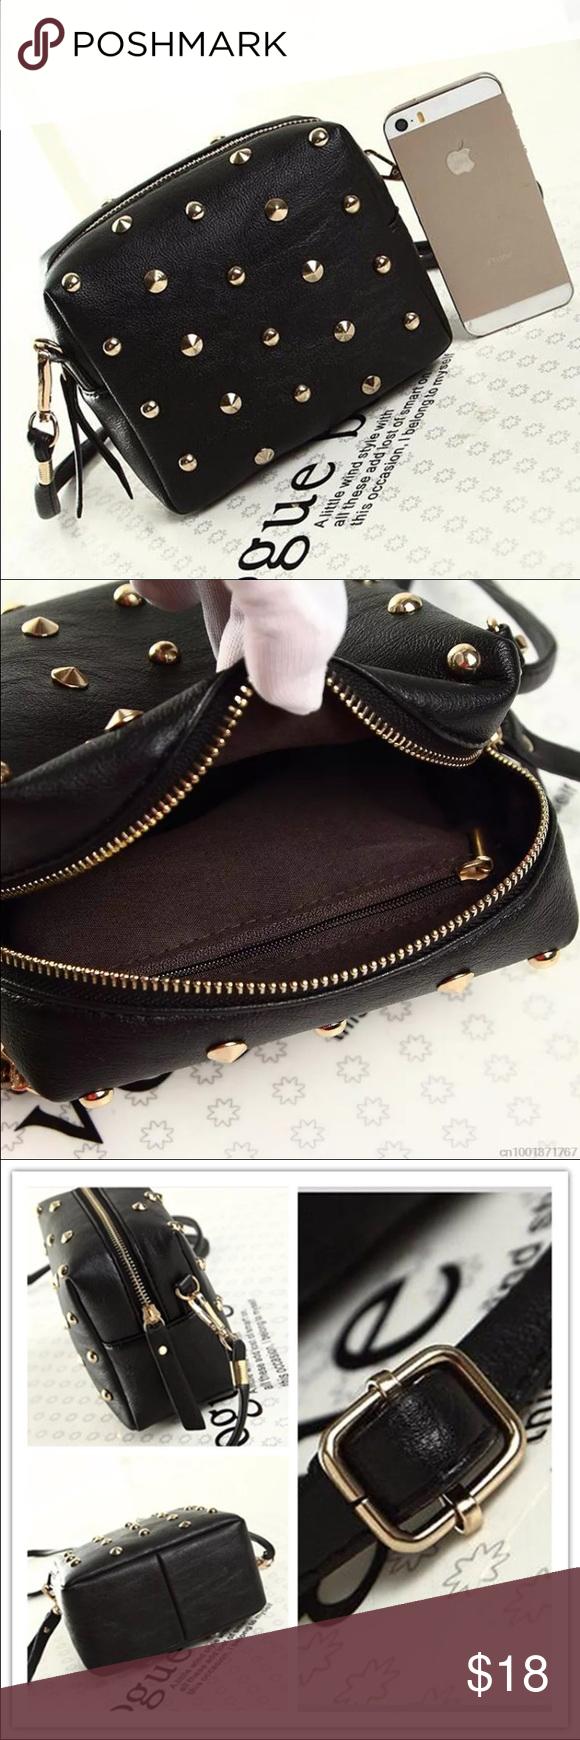 punk mini crossbody bag new with tag Bags Crossbody Bags